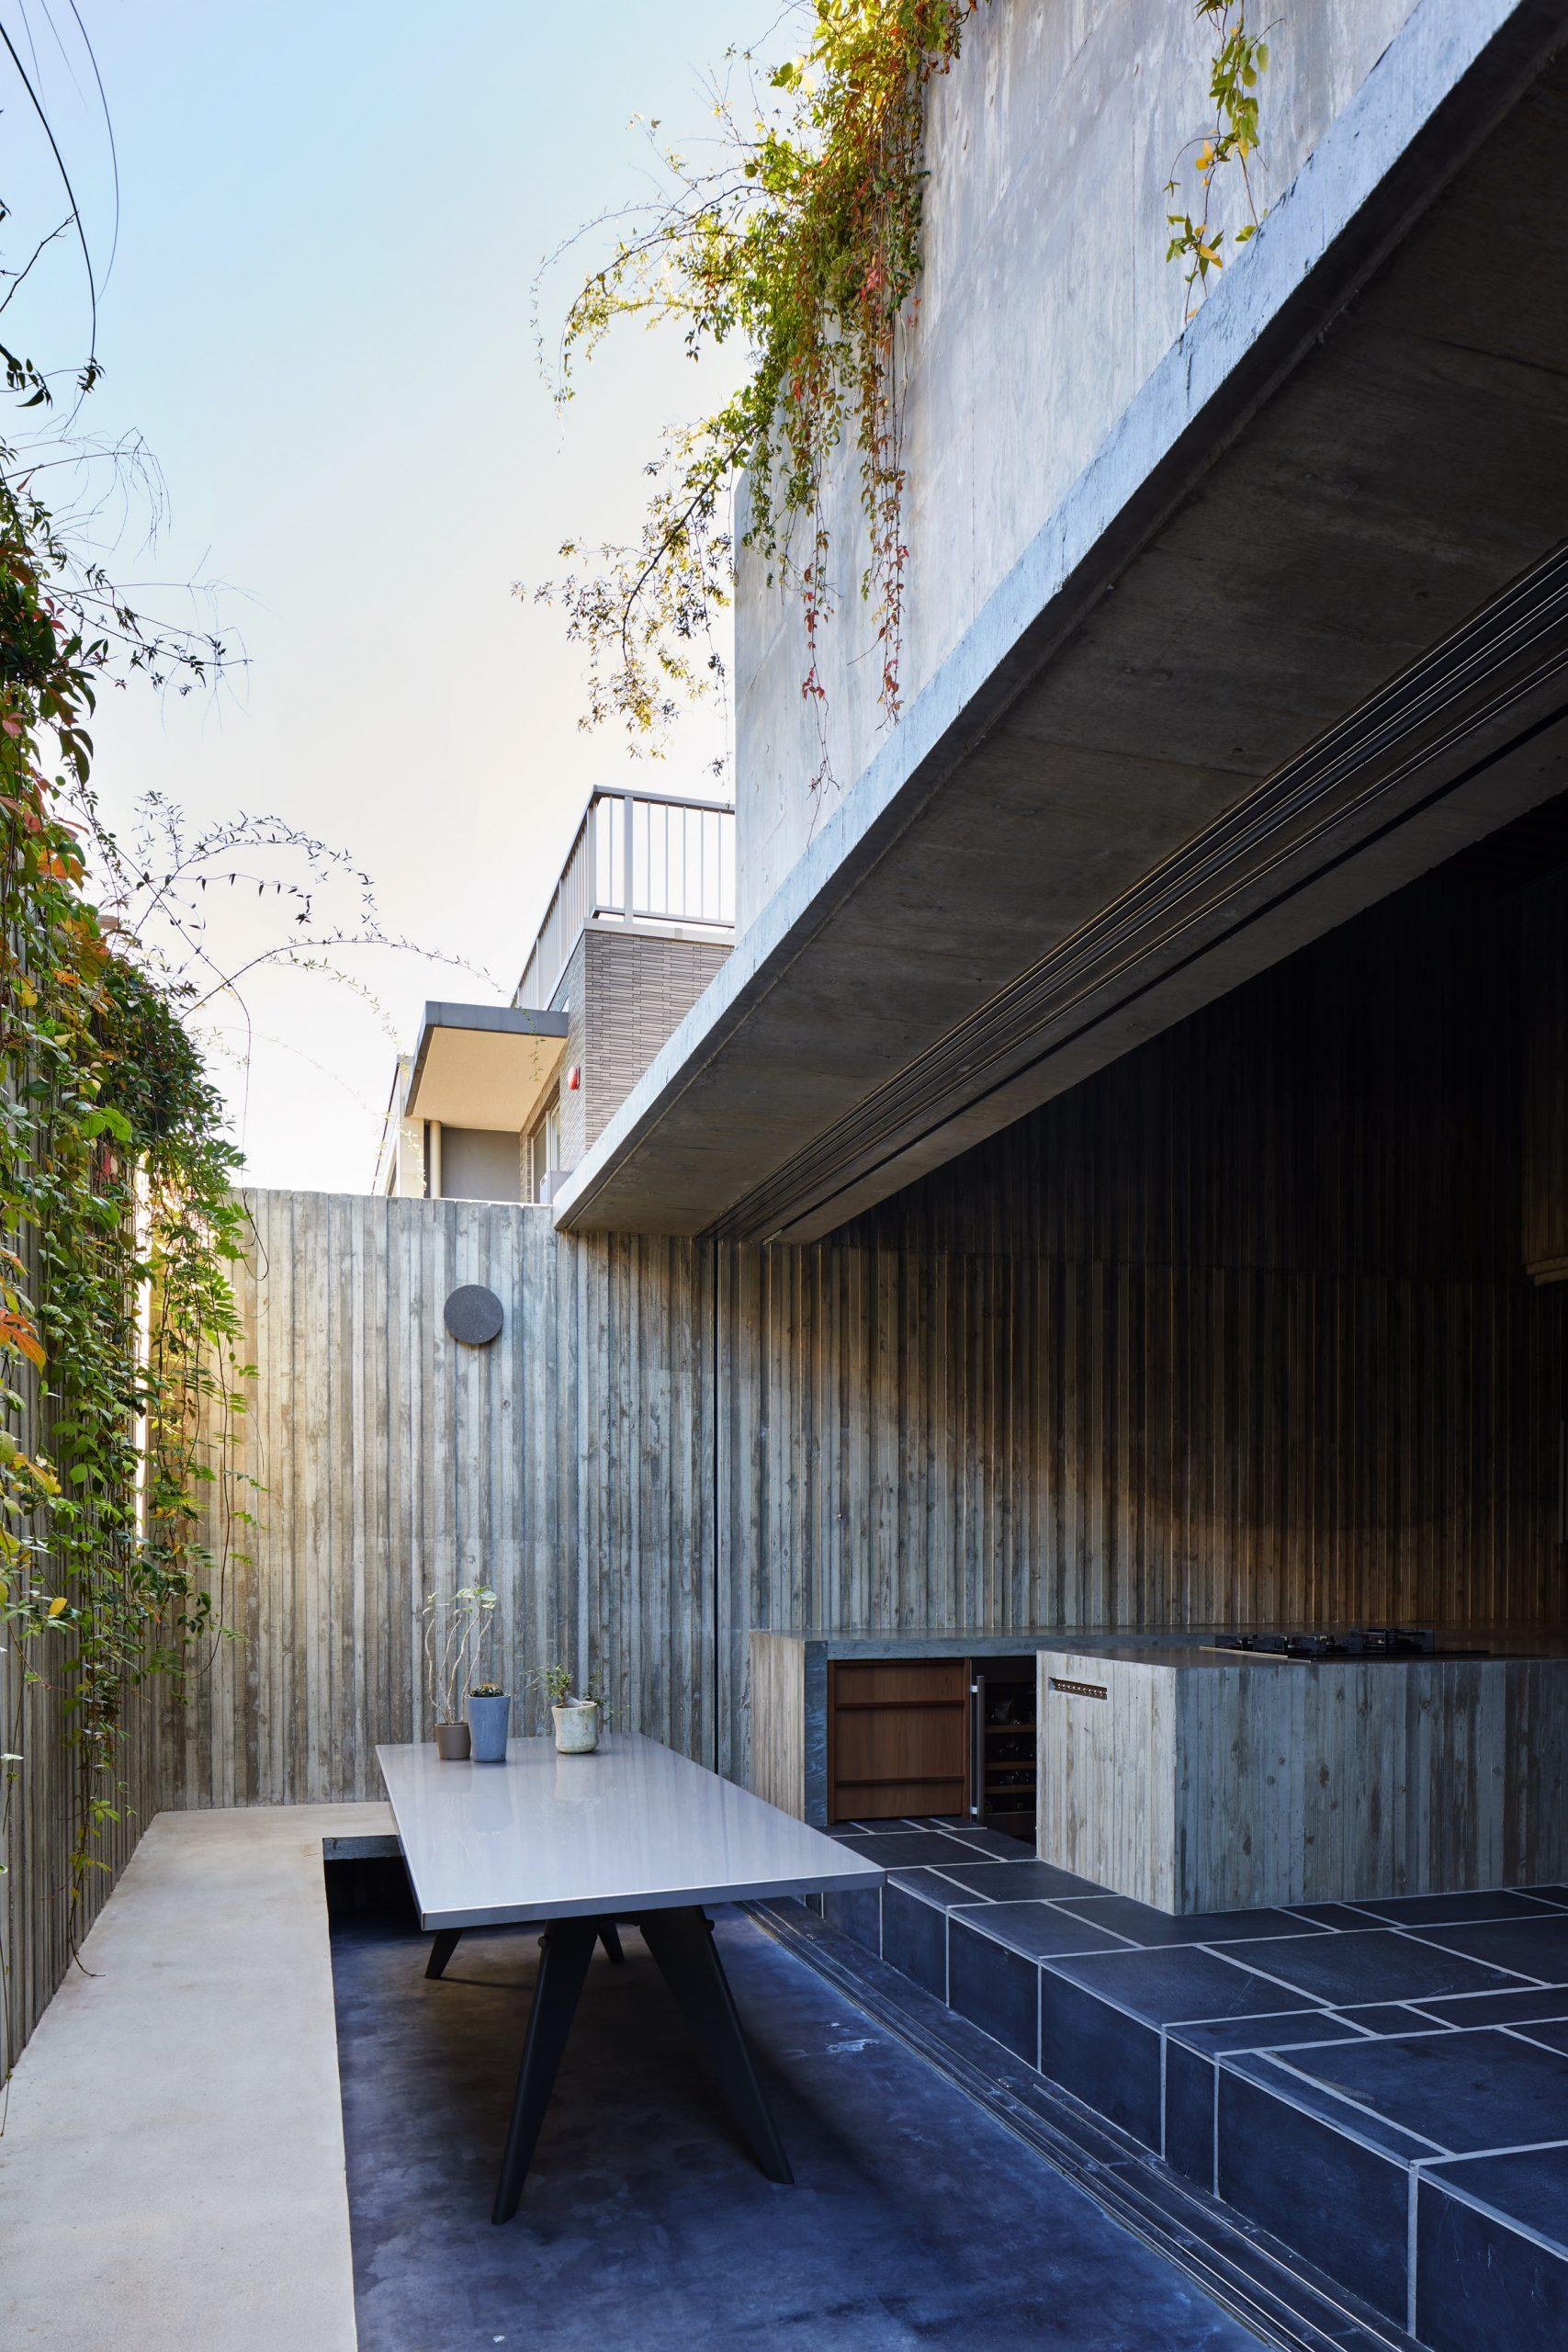 A hidden concrete-walled courtyard in Japan